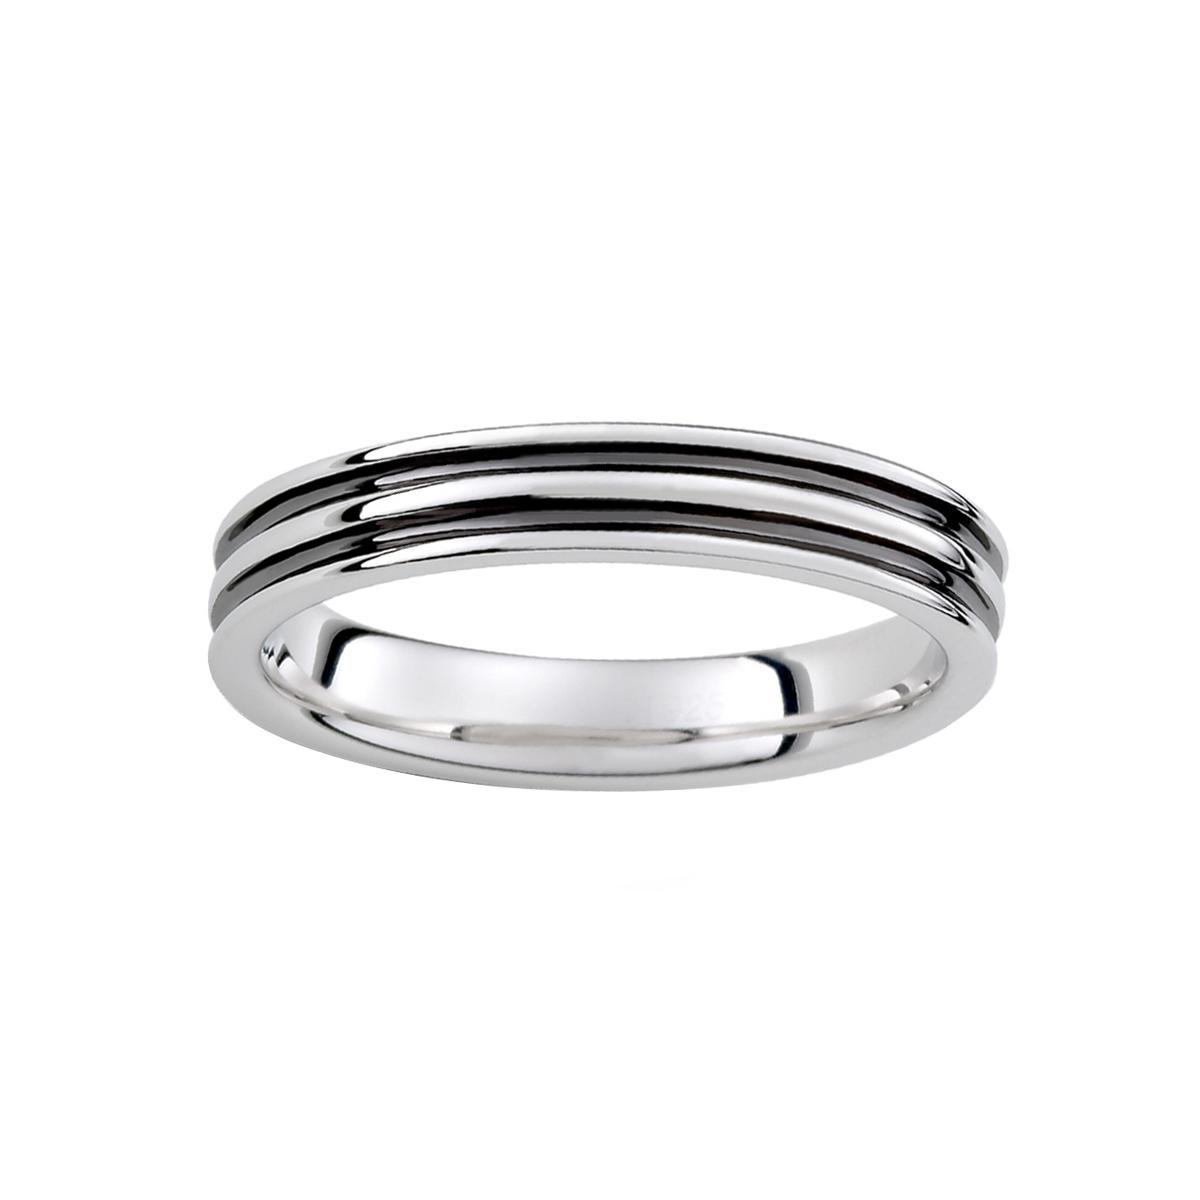 KSM126 秘密雙層線條戒指